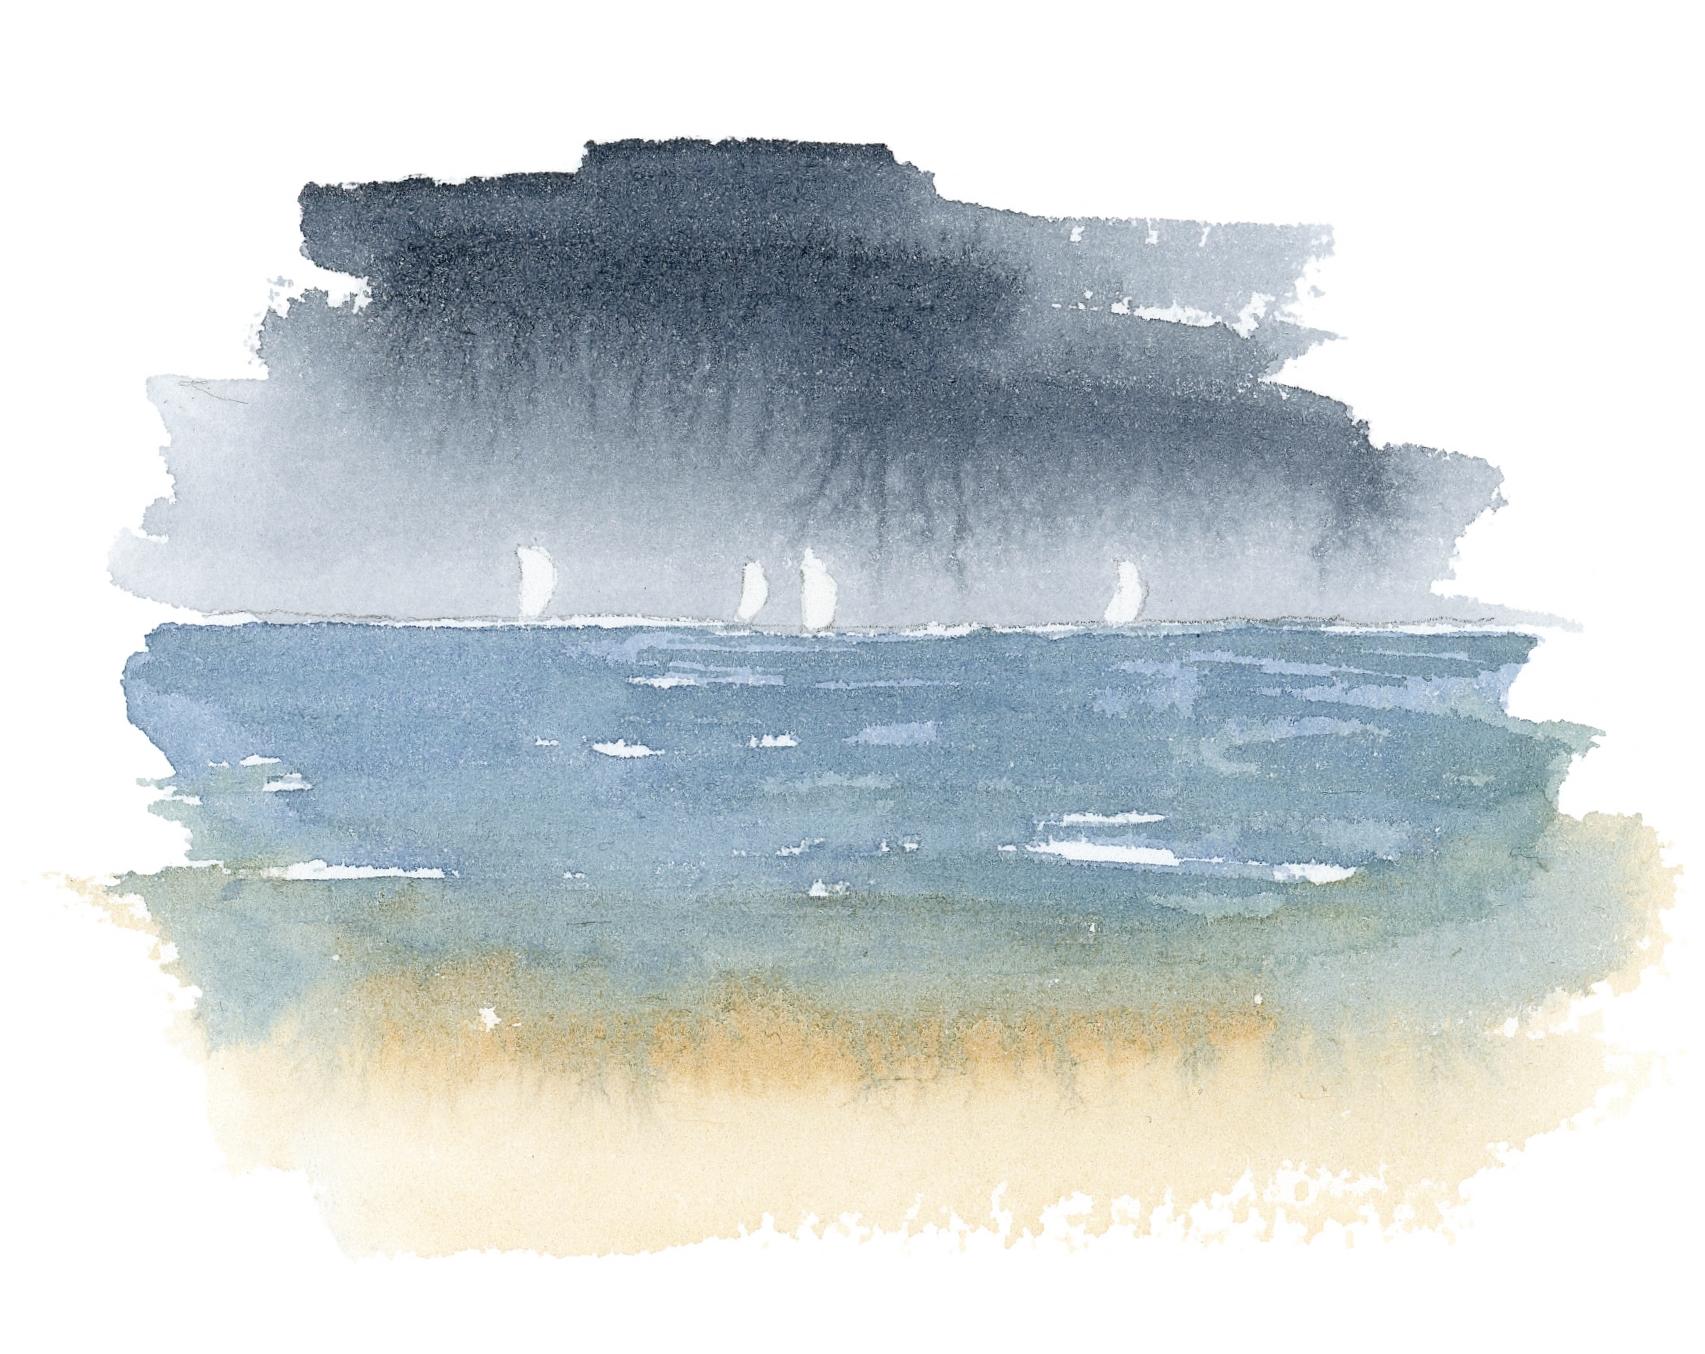 """Veleros a la distancia""  Acuarela Original enmarcada. Tamaño Lámina: 13 x 13 cms. Valor:$ 65.000  DISPONIBLE"